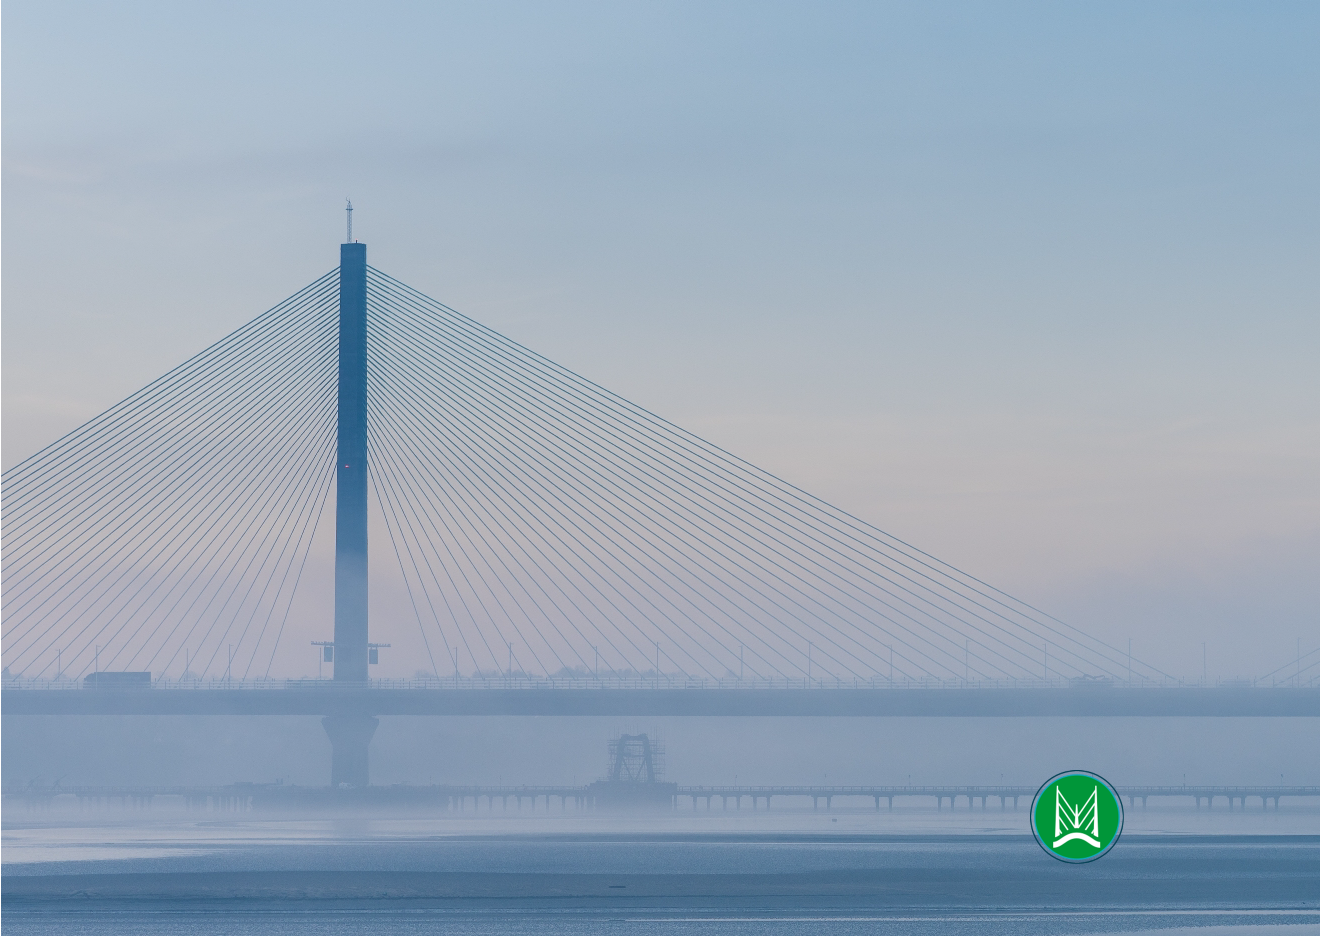 Photo of the Mersey Gateway Bridge with the Merseyflow logo